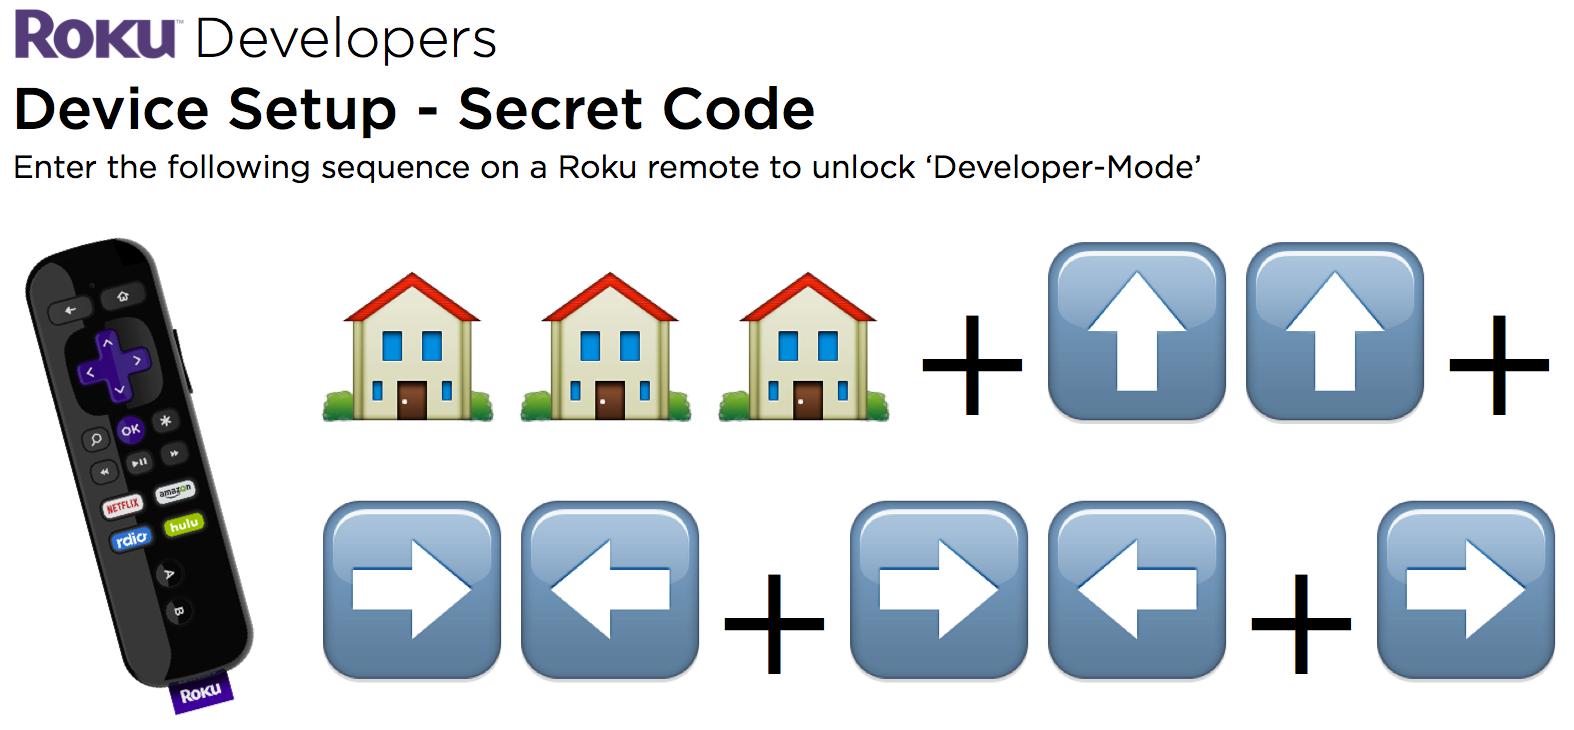 Device Setup Guide For Roku Developers